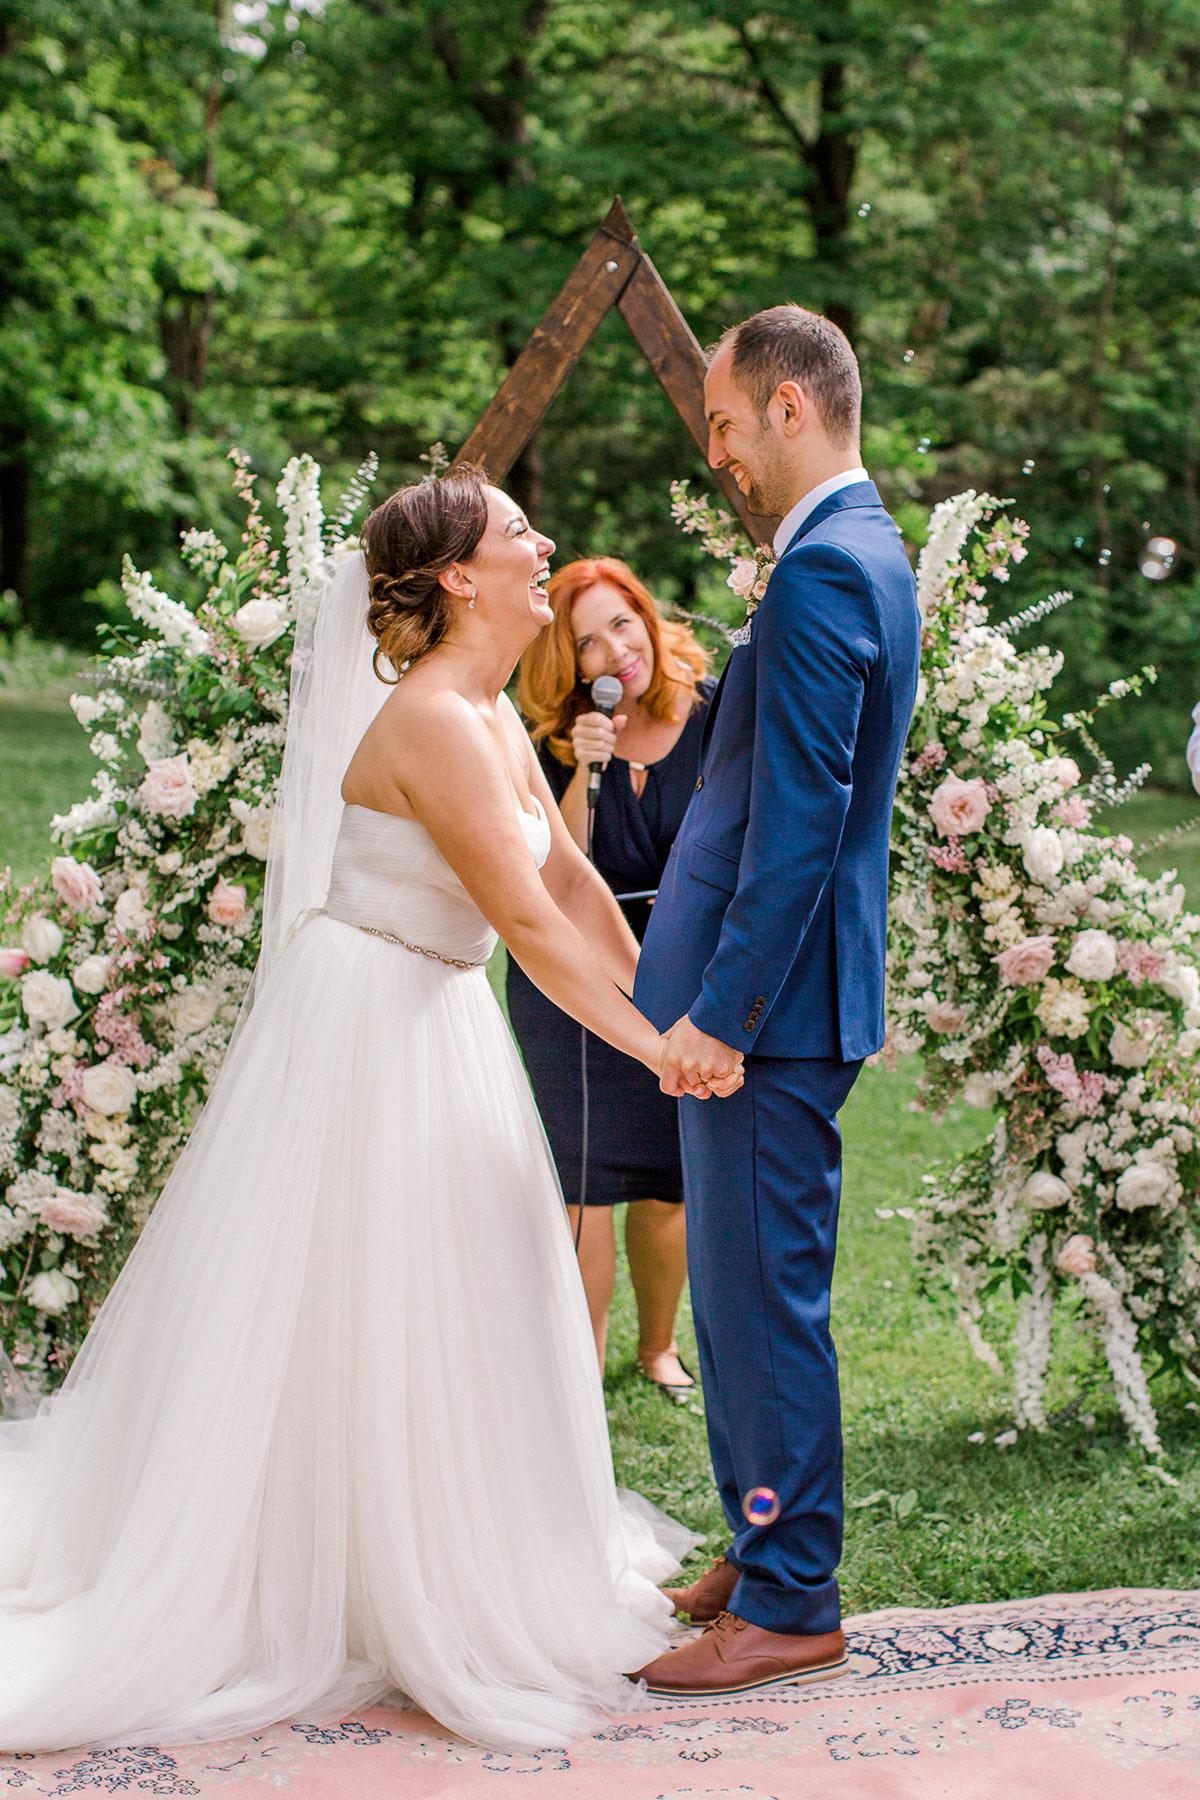 beatrice-elford-photography-vineyard-bride-swish-list-balls-falls-vineland-wedding-49.jpg